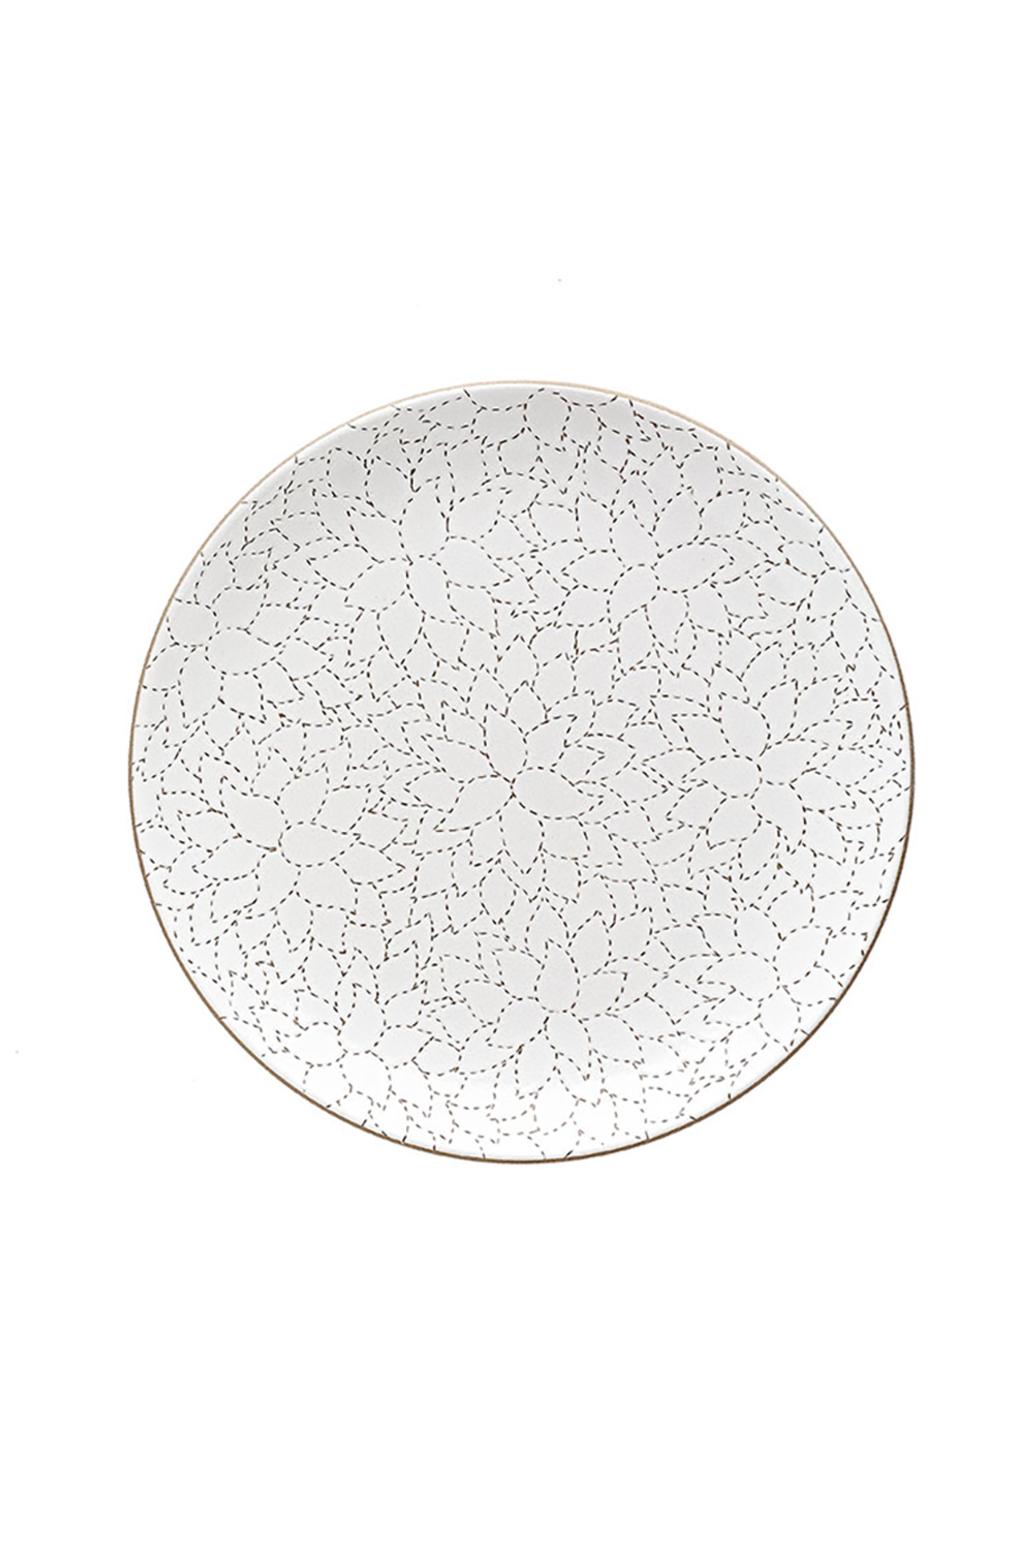 Heath ceramics alabama chanin camellia etched dinner plate2